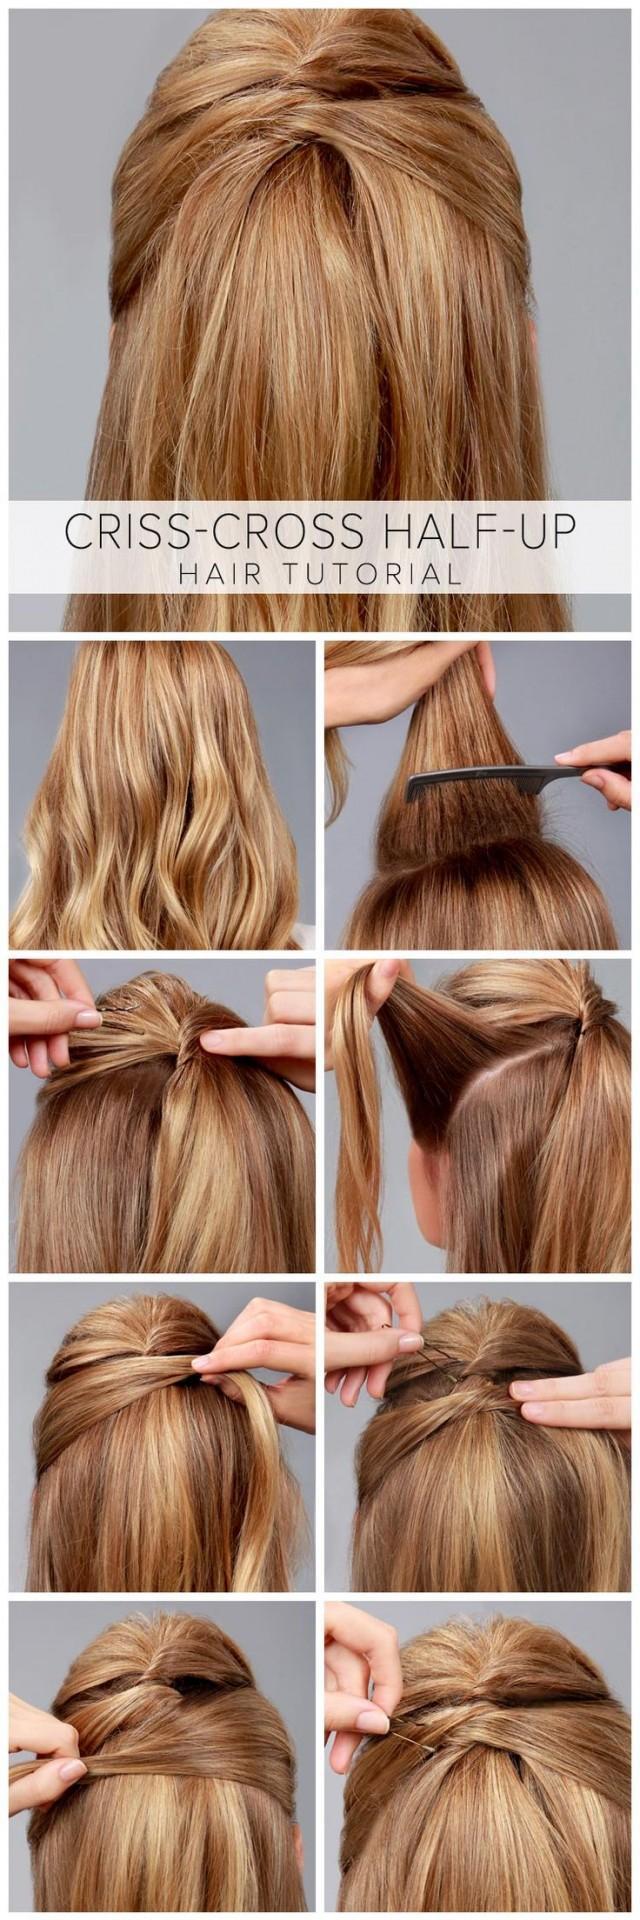 Diy lulus crisscross halfup hair tutorial hair pinterest